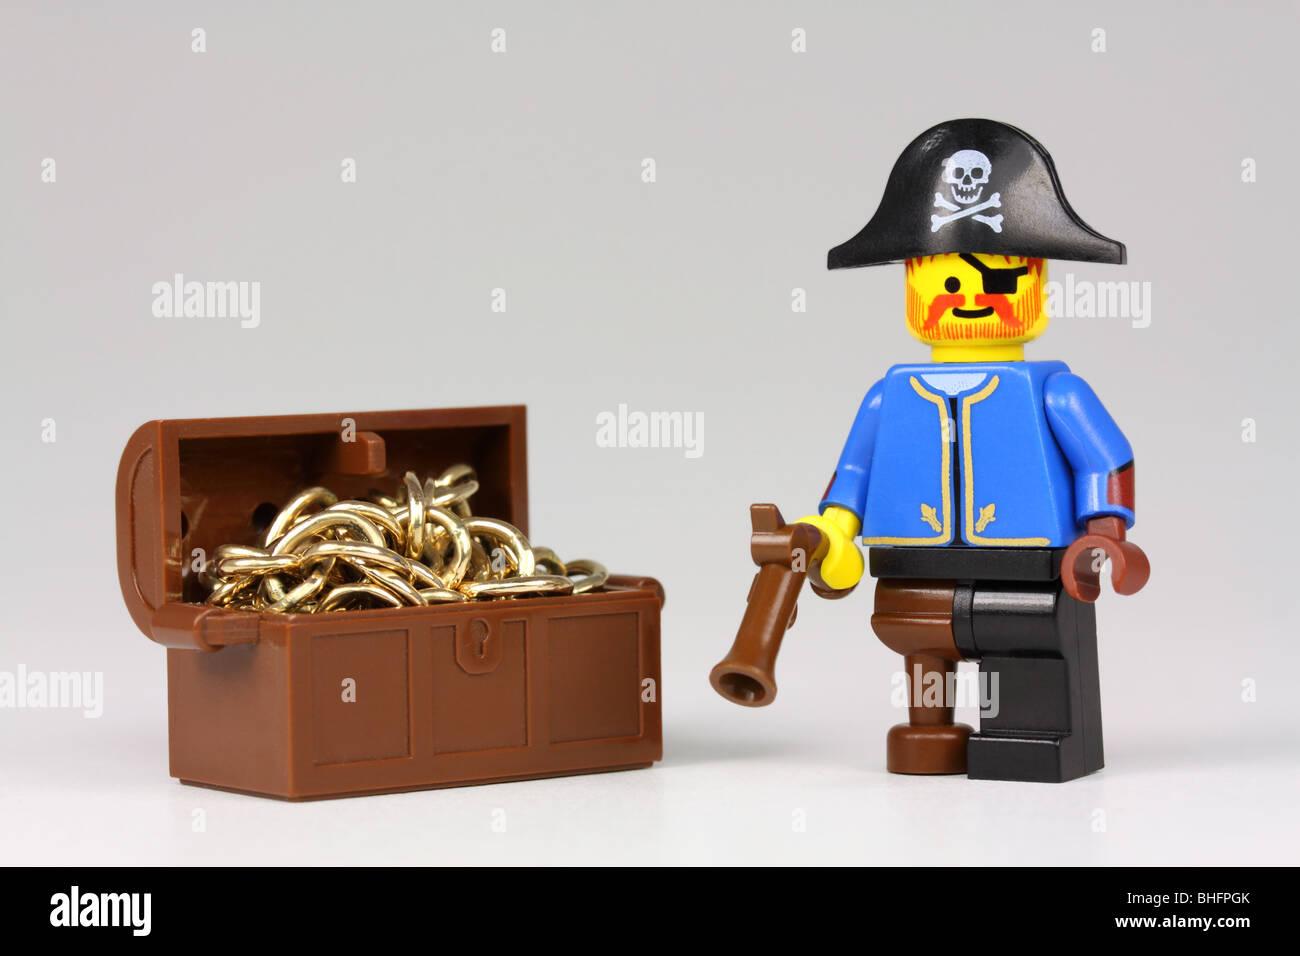 Treasure Toys Cartoon : Lego pirate and treasure chest full of gold stock photo